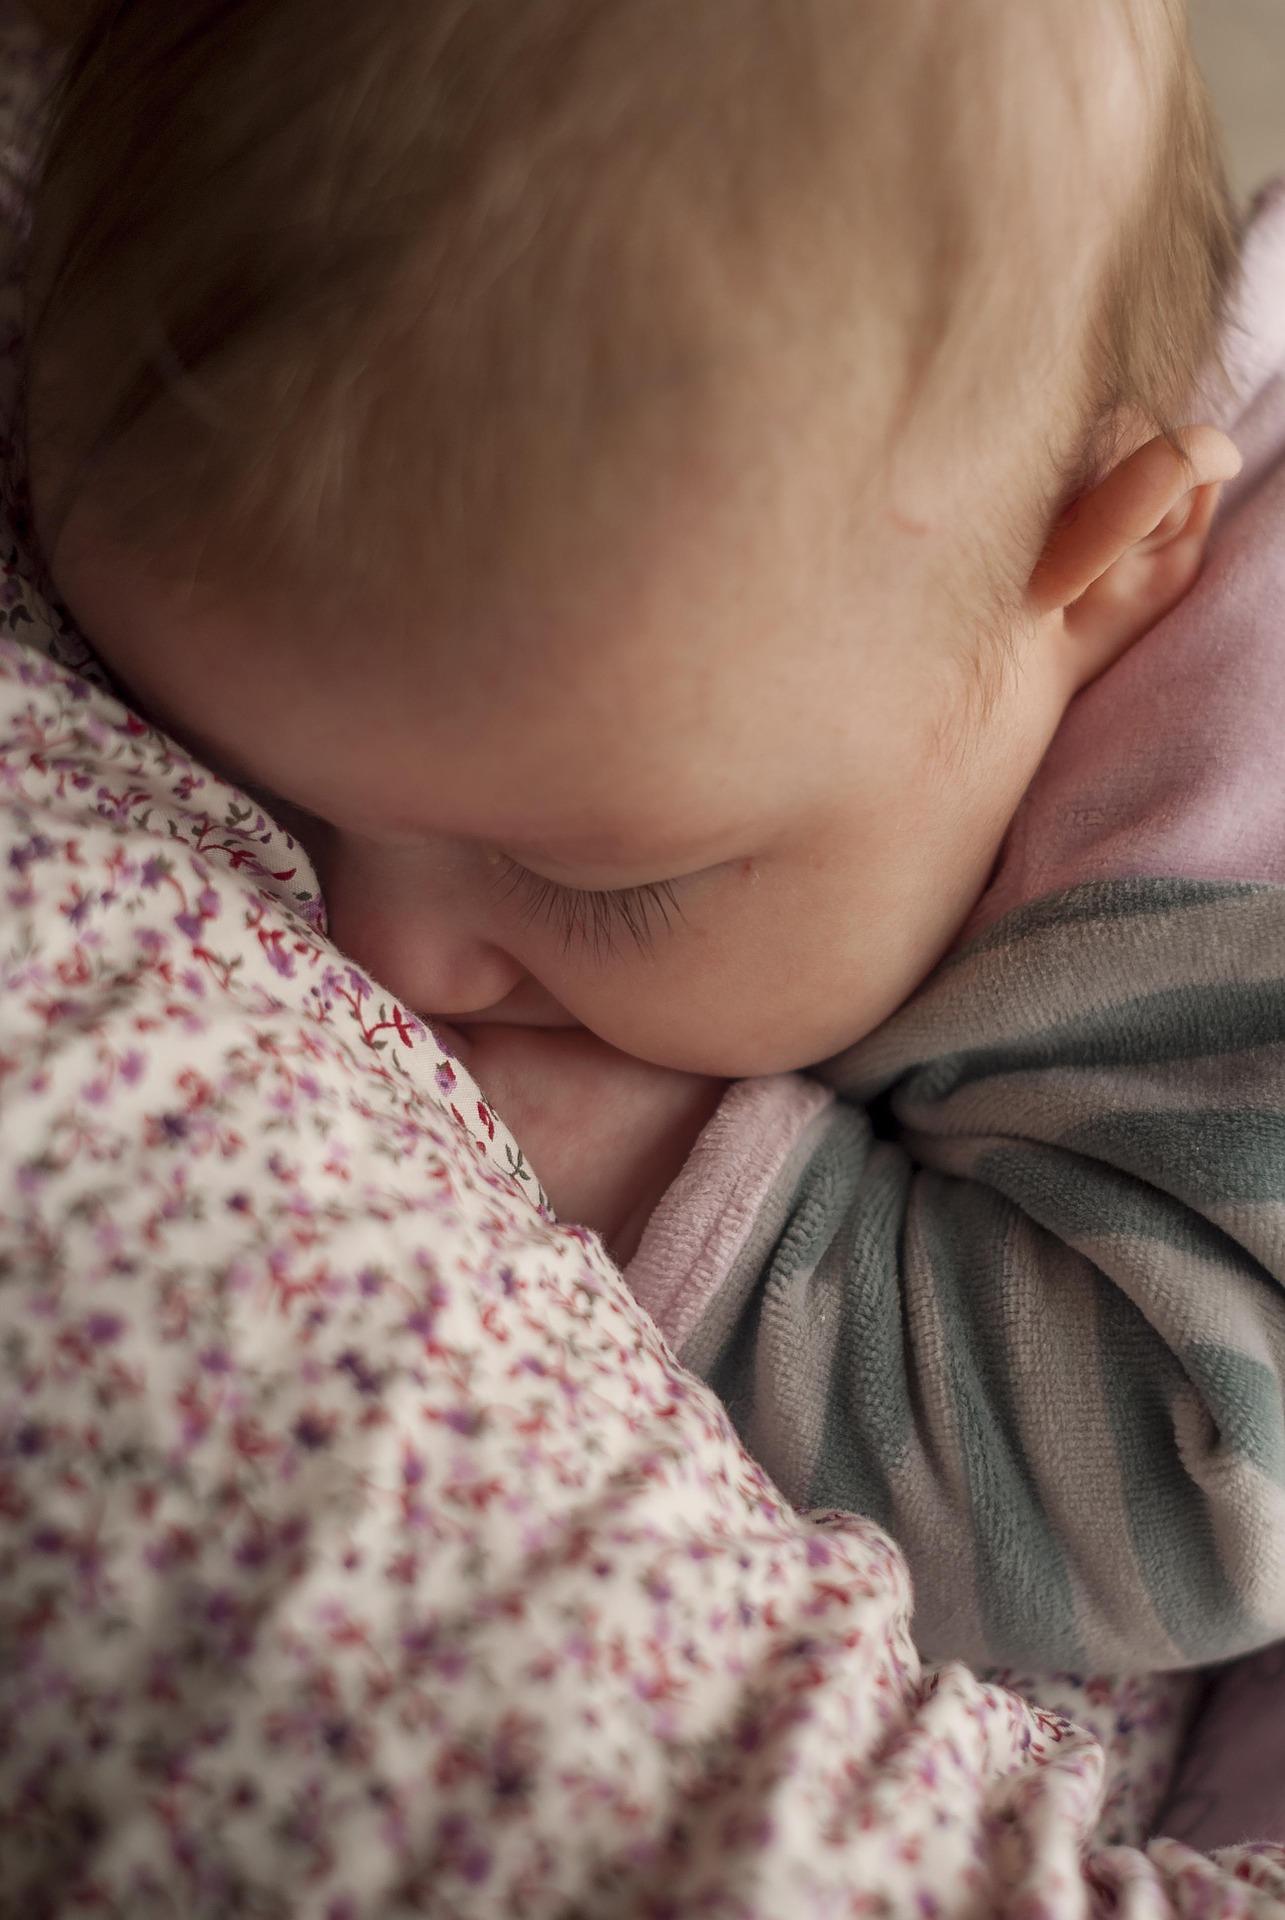 baby-1106703_1920.jpg